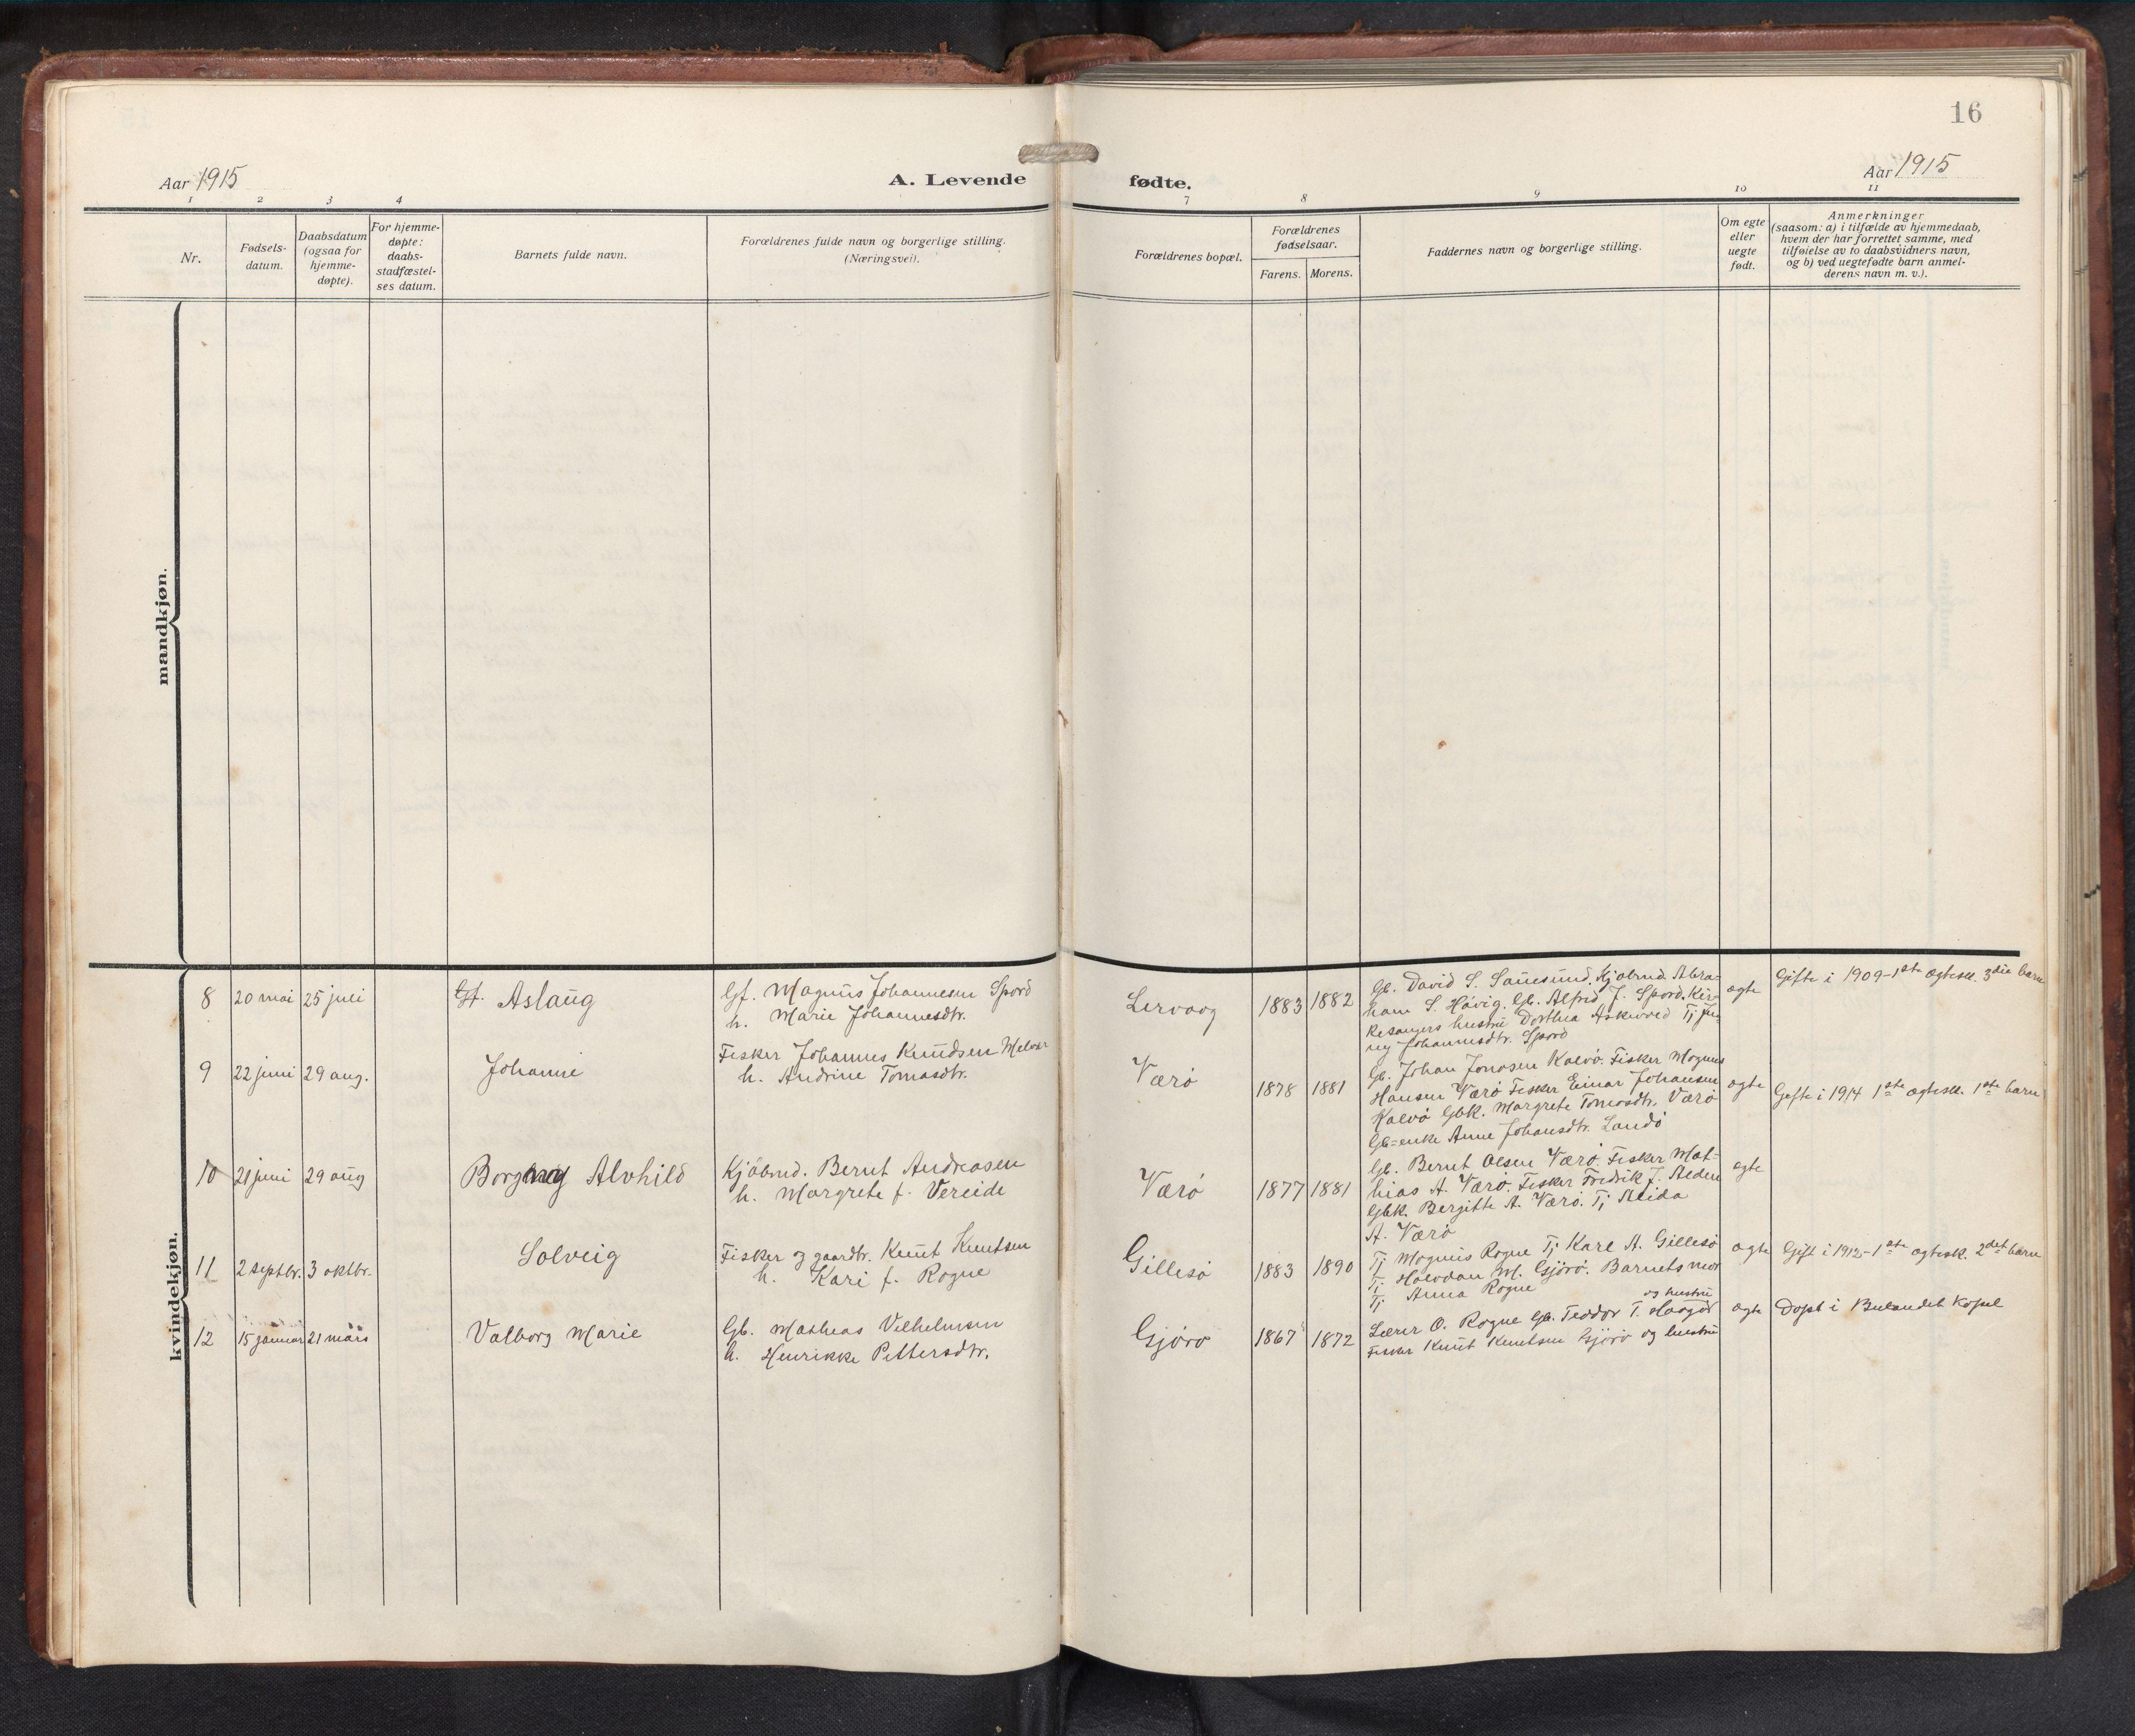 SAB, Askvoll sokneprestembete, H/Hab/Habb/L0002: Klokkerbok nr. B 2, 1910-1947, s. 15b-16a